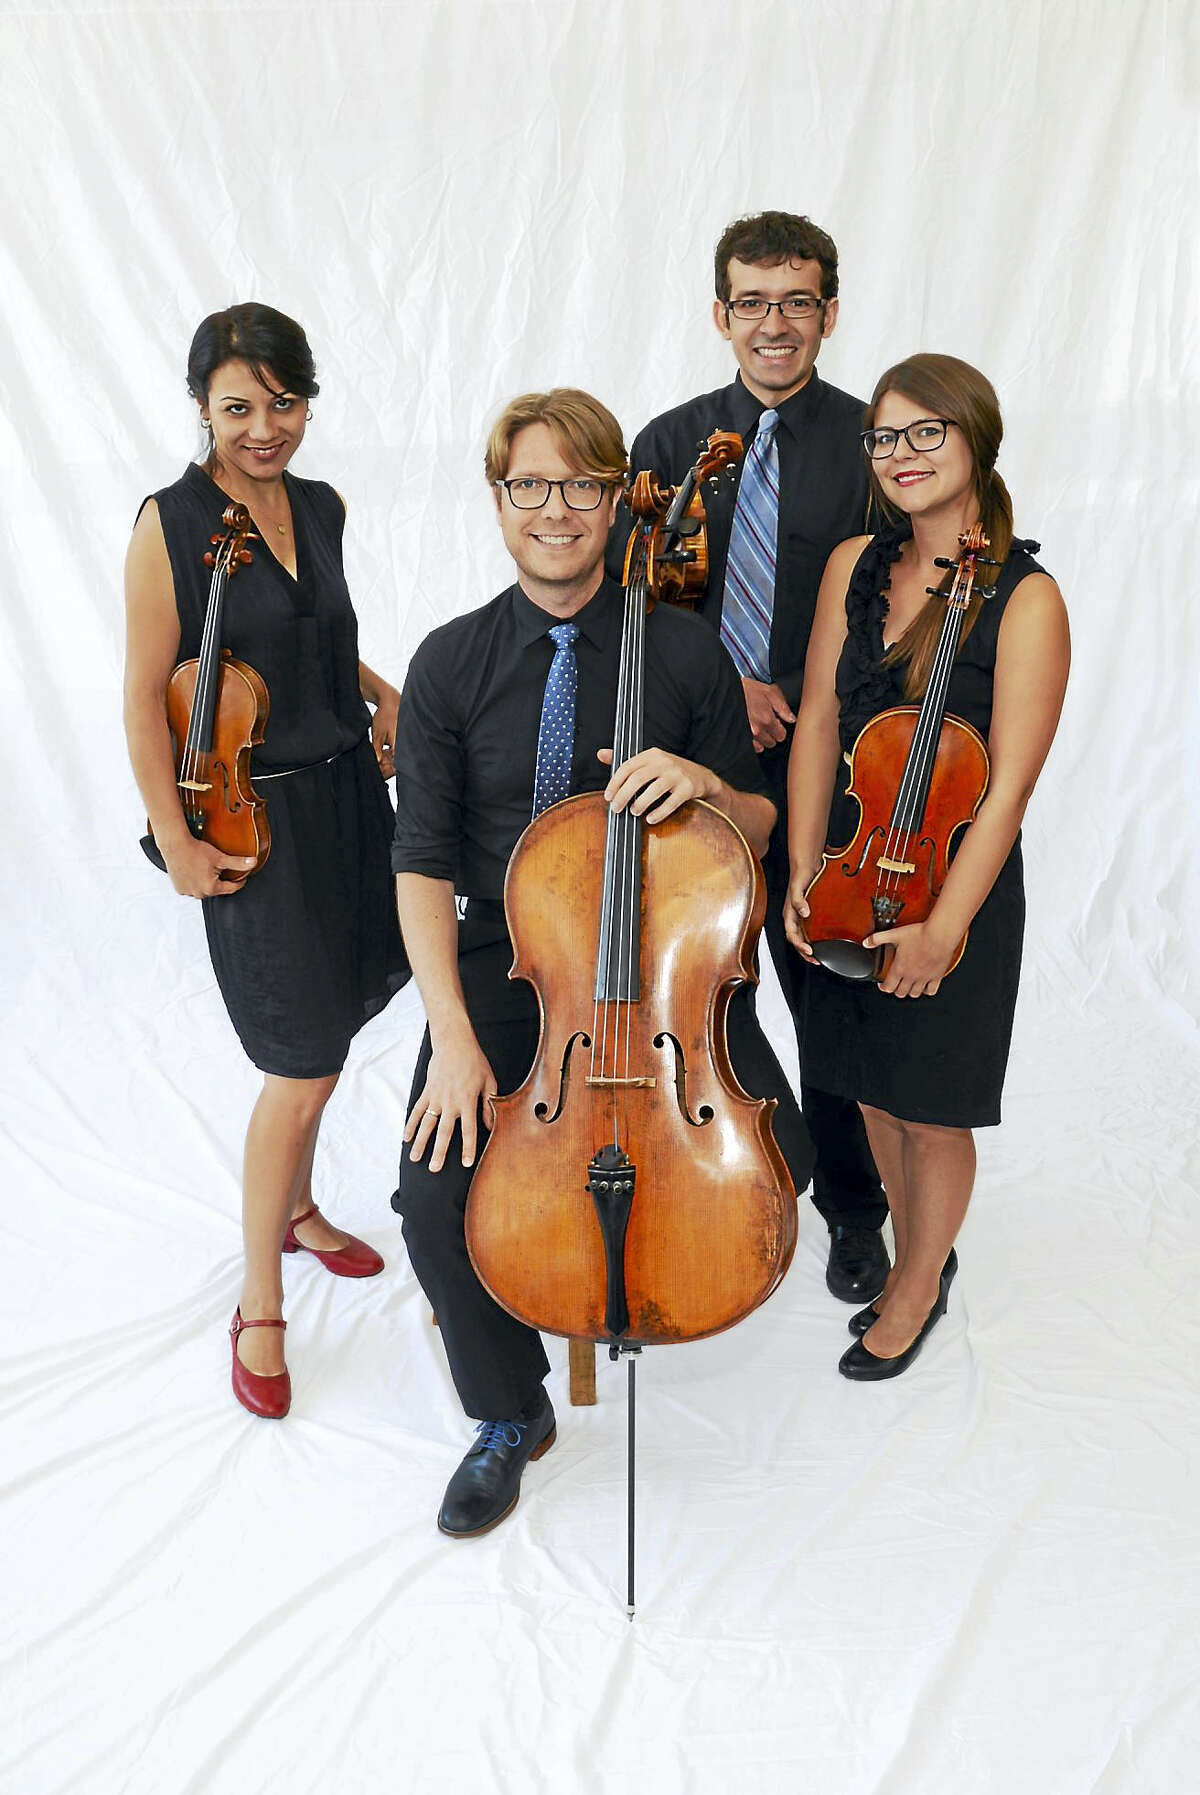 From left, Yaira Matyakubova, Philip Boulanger, Gregory Tompkins and Annalisa Boerner of the Haven String Quartet.